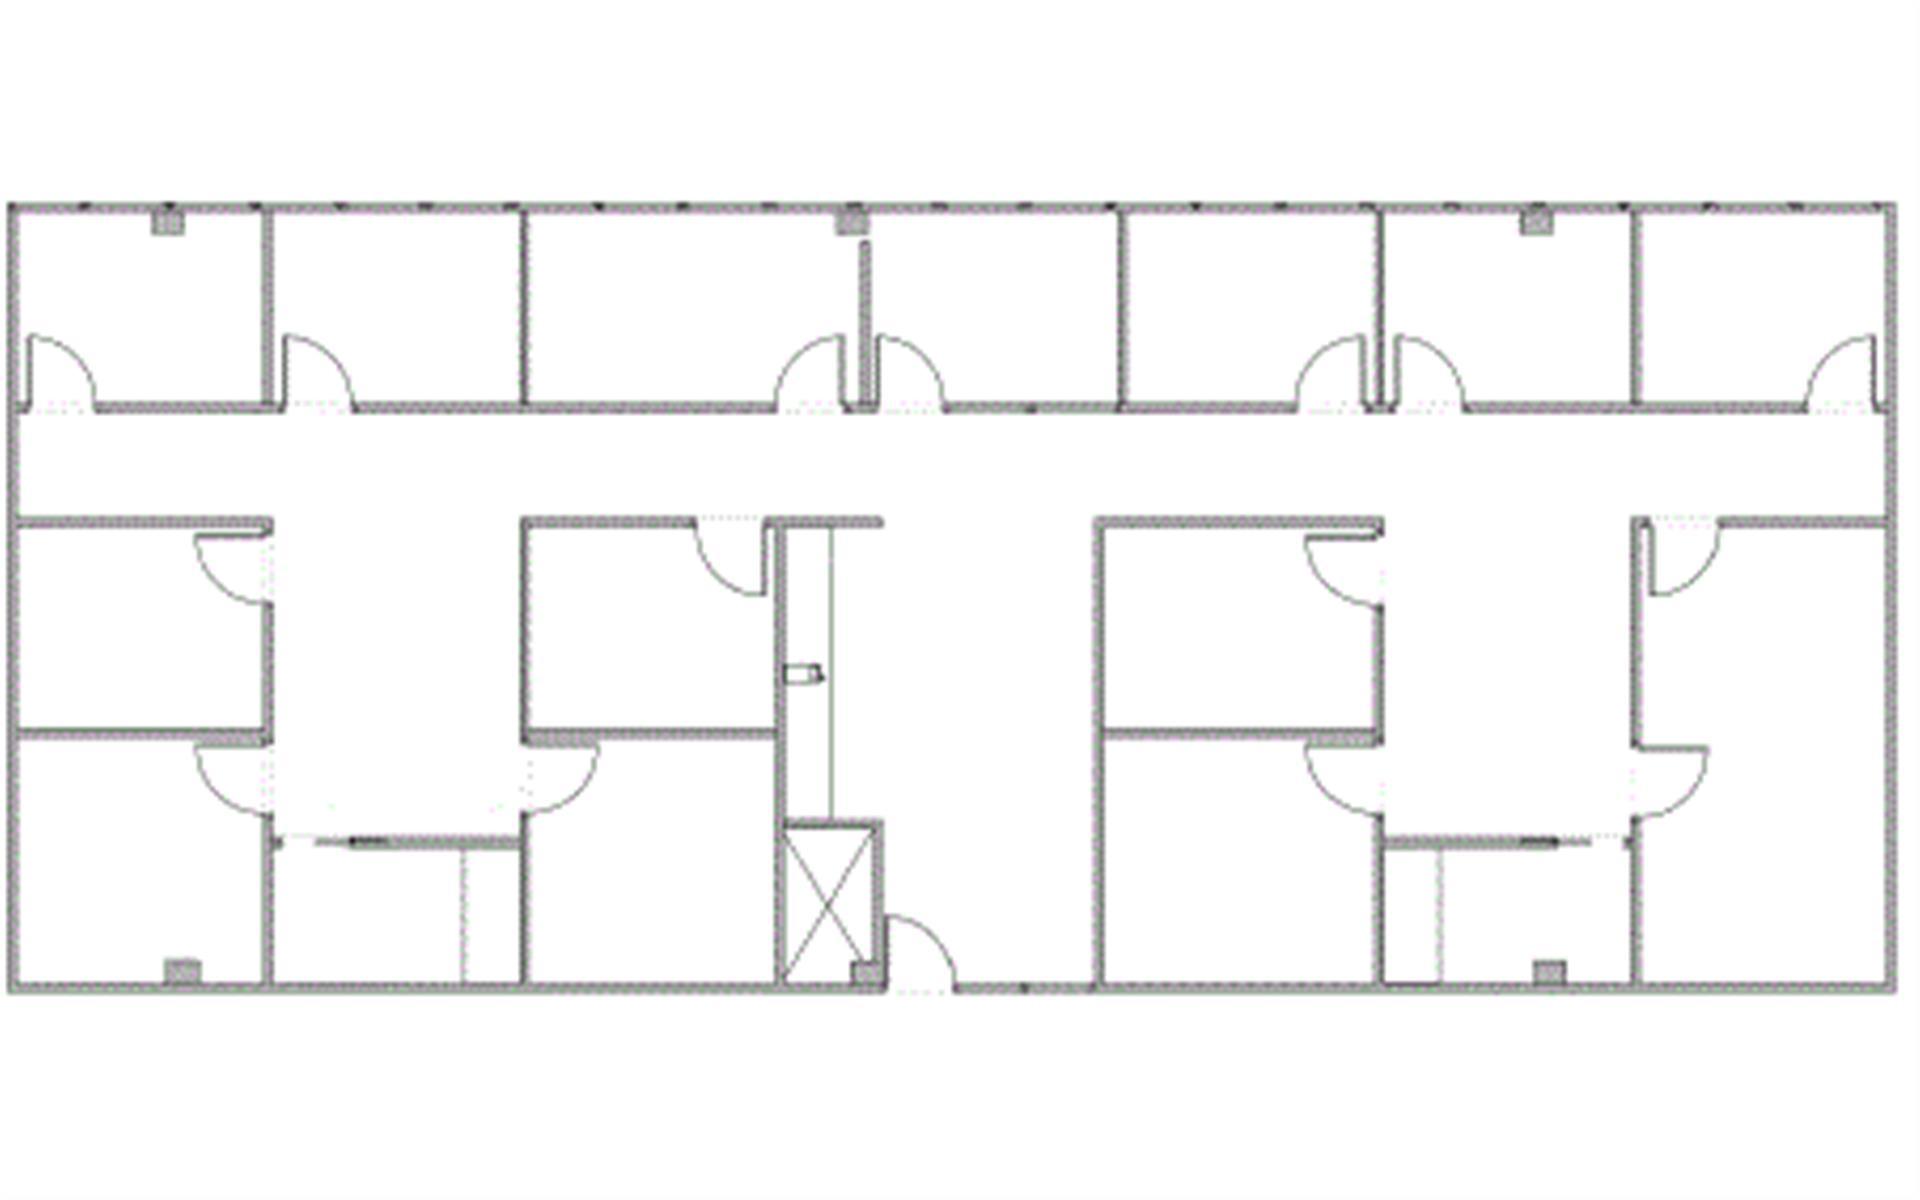 Boxer - Northwest Central - Team Office | Suite 262.01